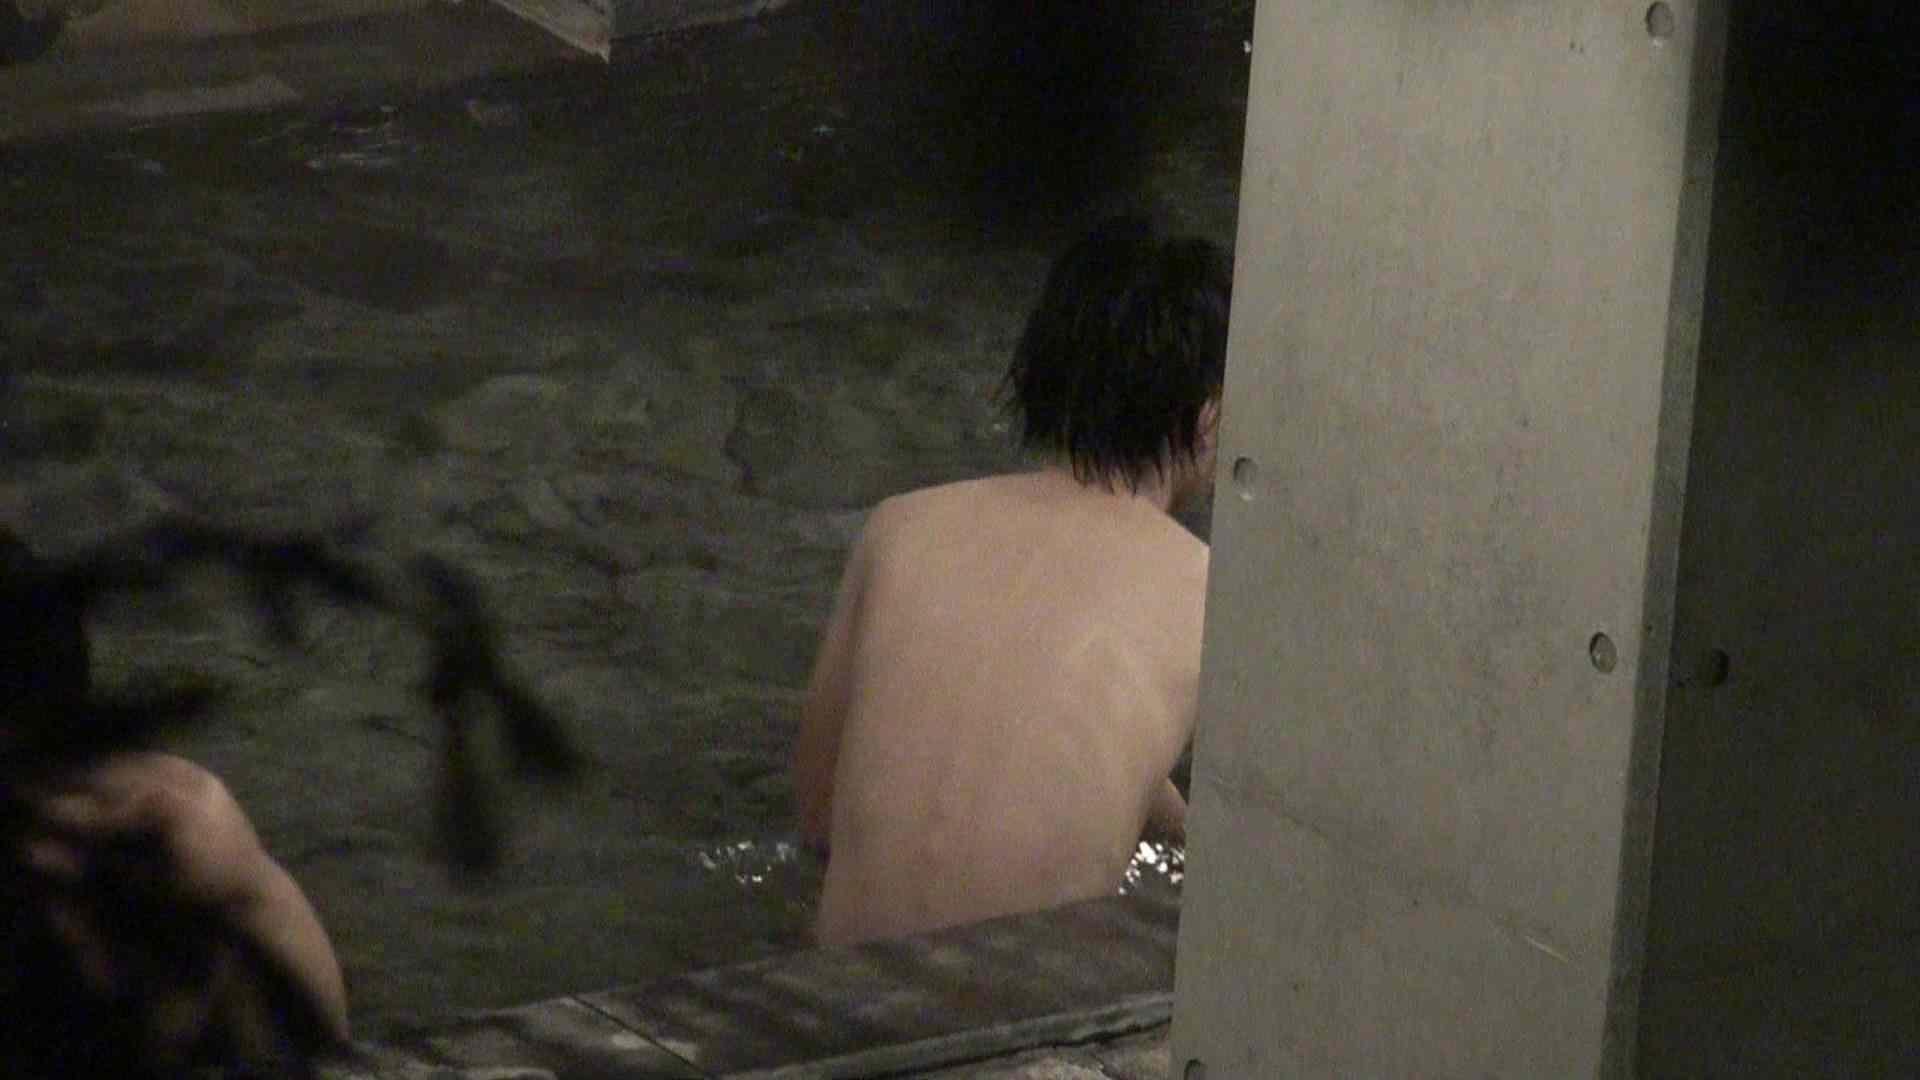 Aquaな露天風呂Vol.323 盗撮大放出 すけべAV動画紹介 69連発 54